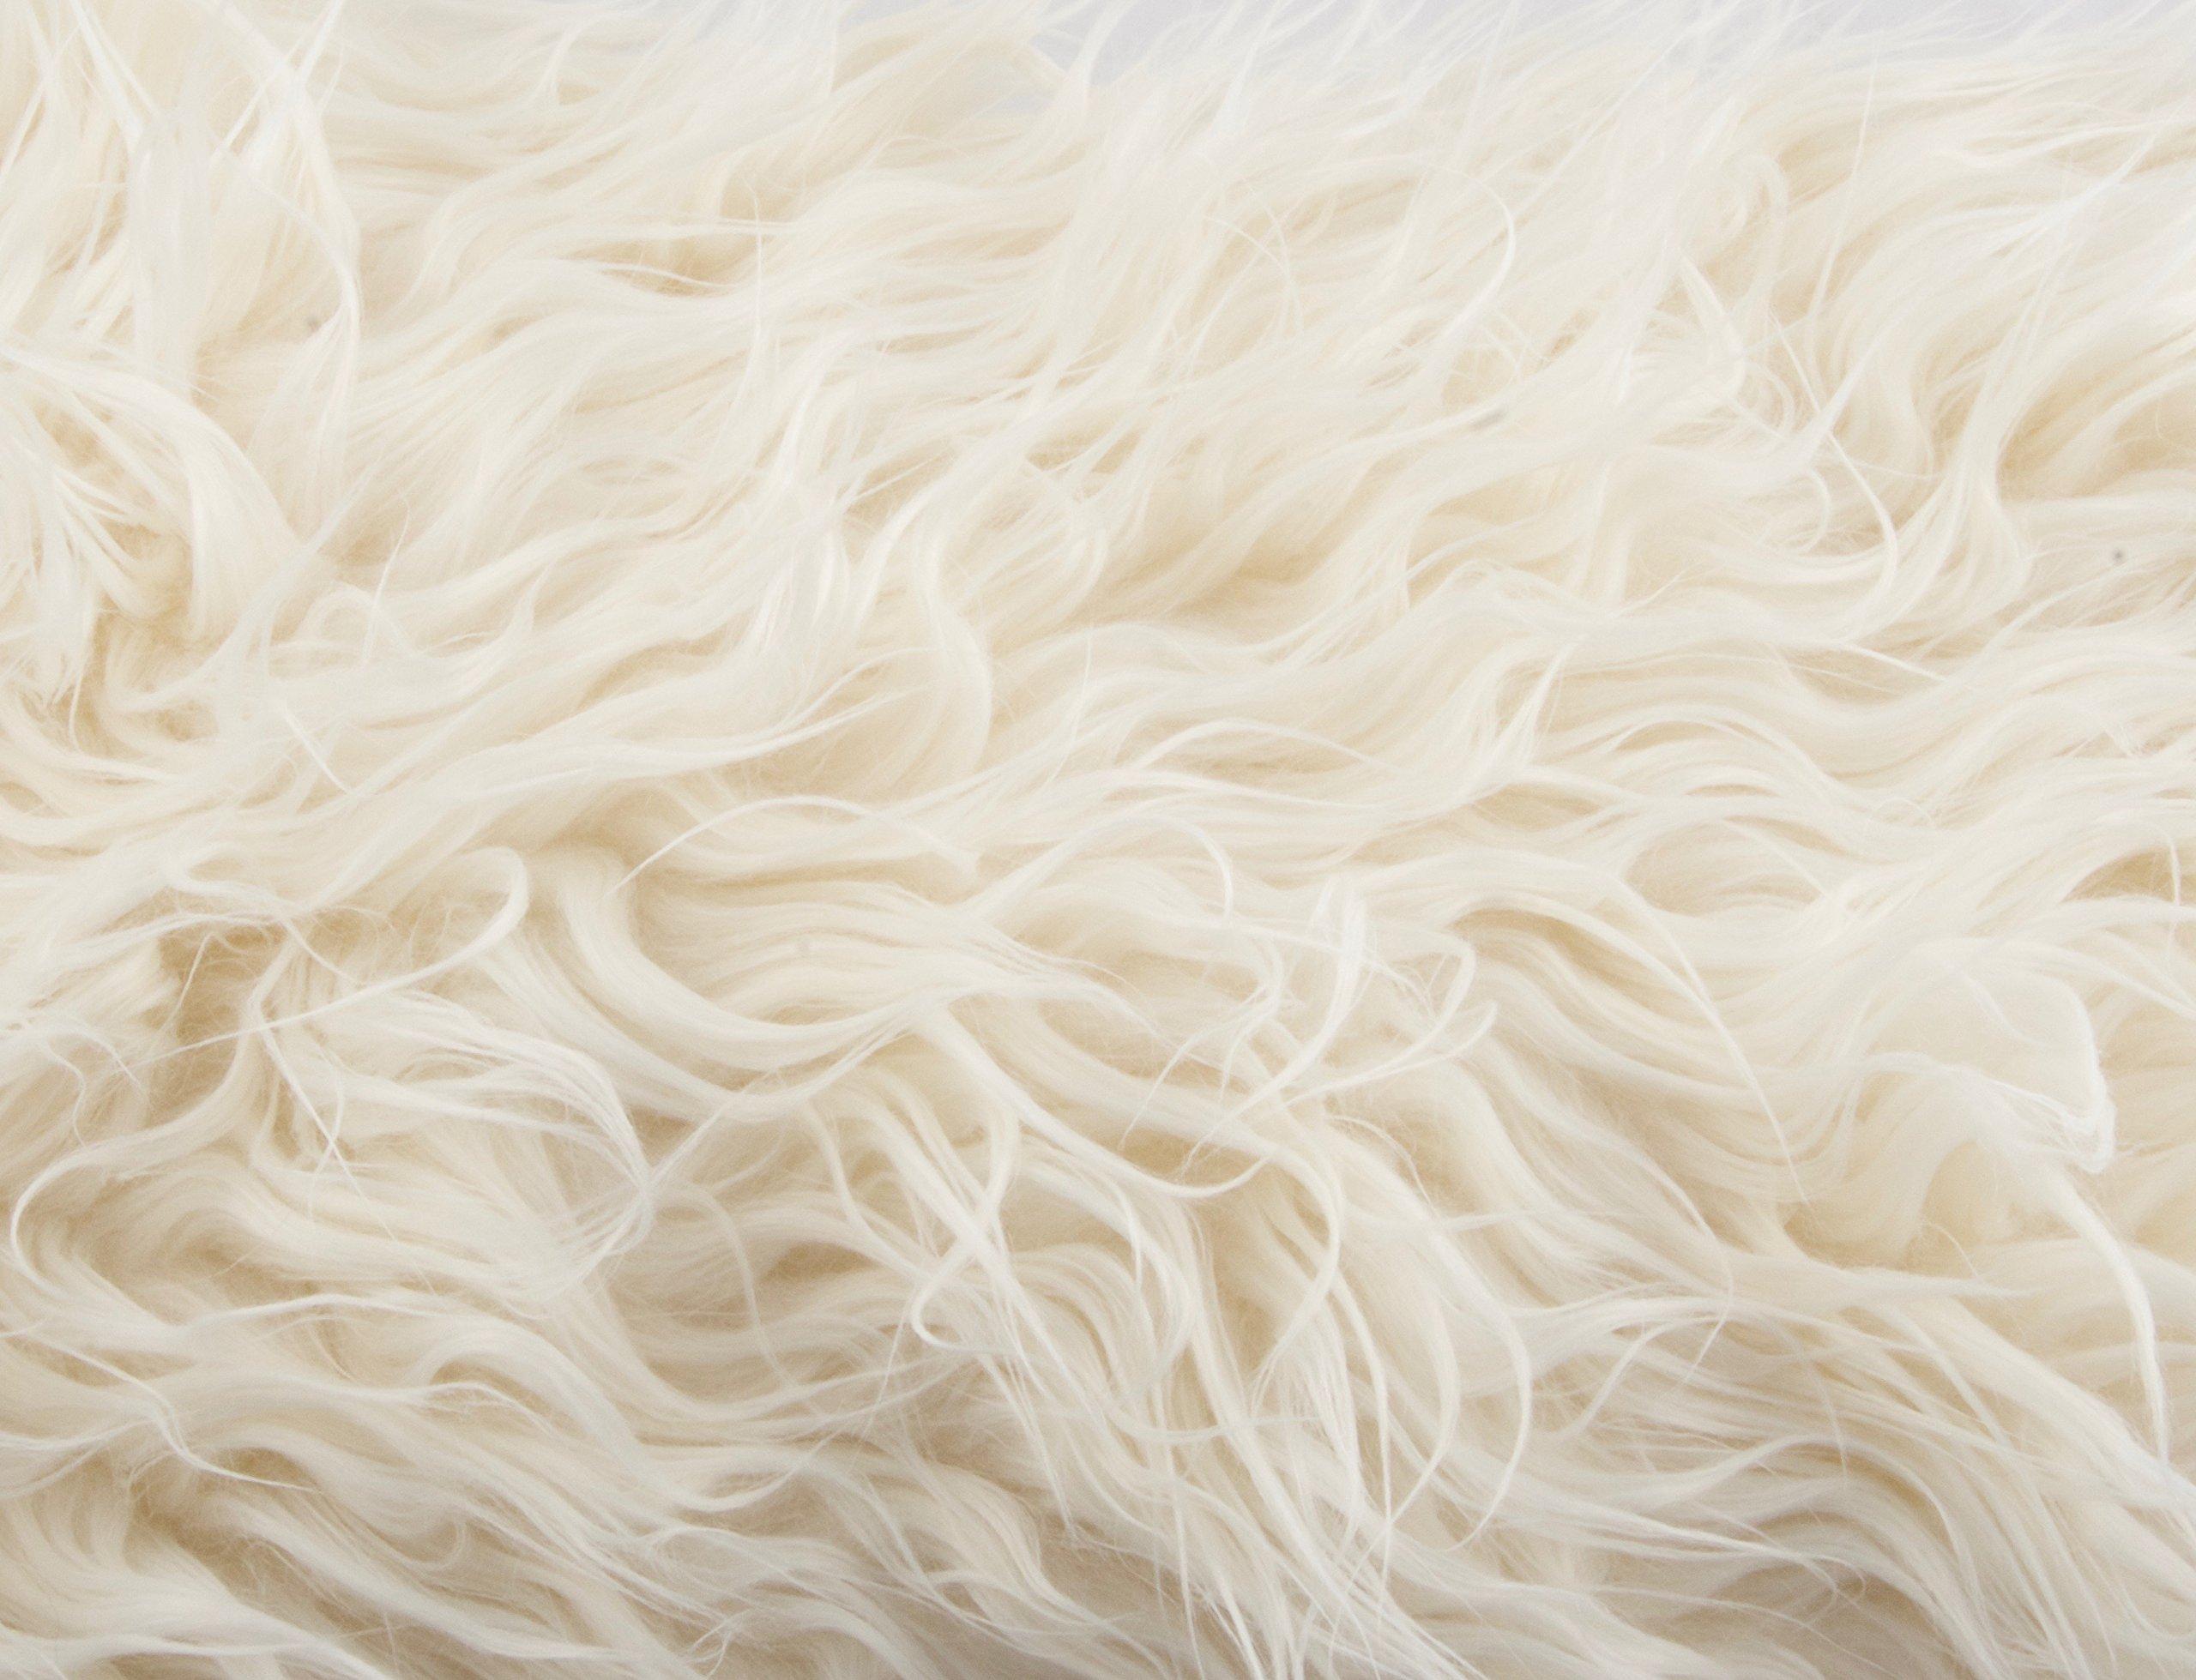 Camera Photo Floor Prop Faux Fur Artificial Fur, Newborn Baby Photography Props, Basket Stuffer Blanket - Baby Props, Basket Fabric (Ivory Fur)